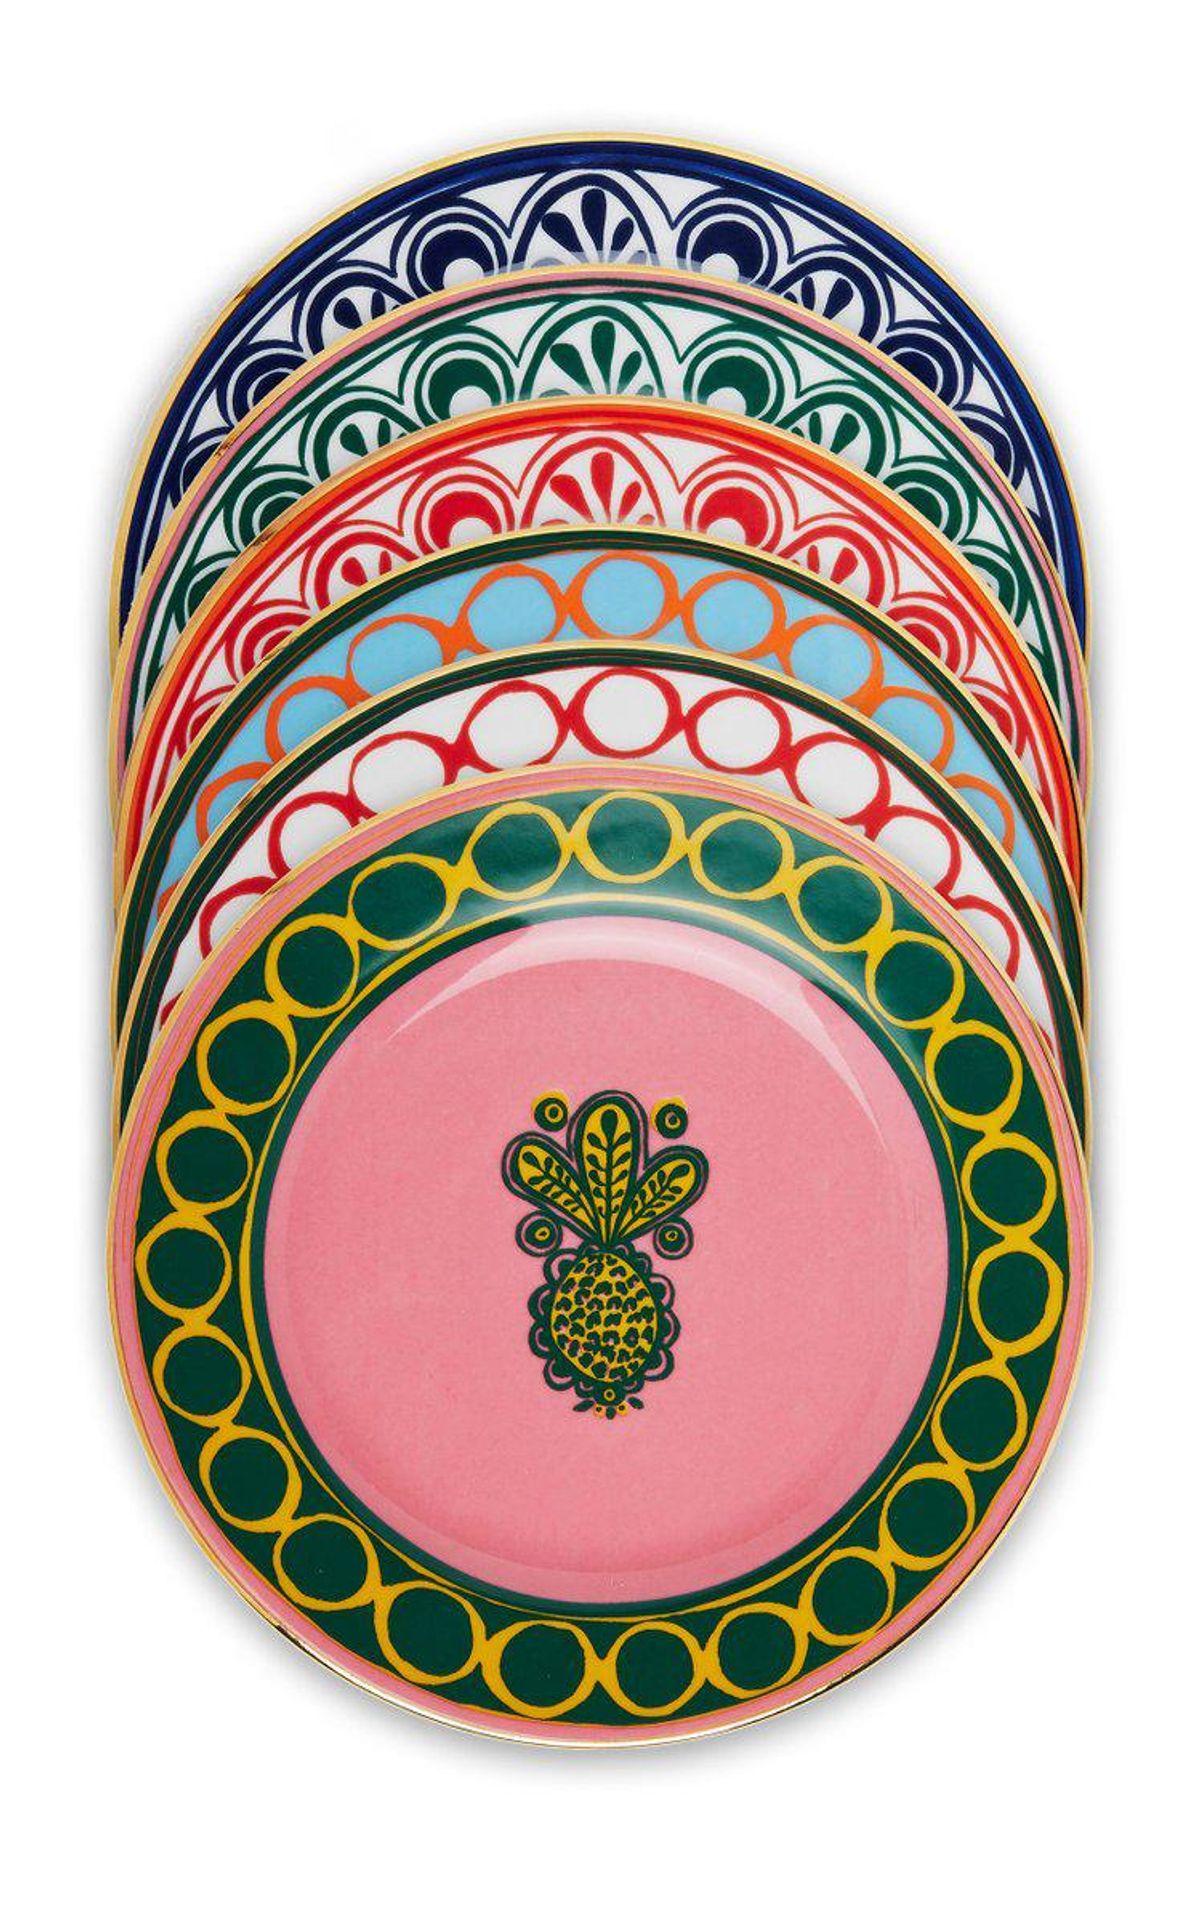 Set-of-6 Painted Porcelain Dessert Plates